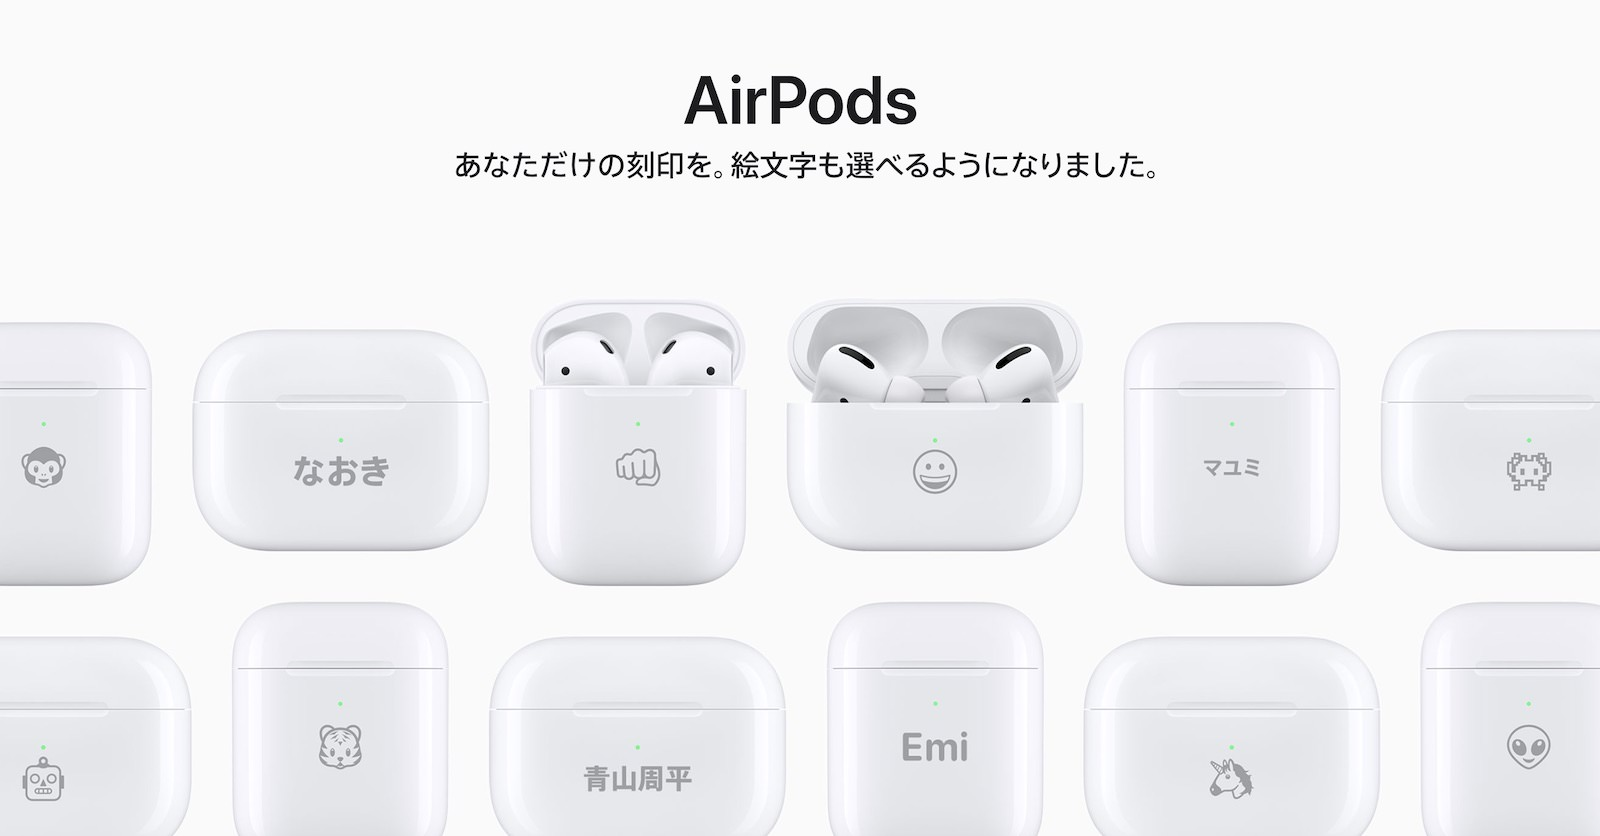 AirPods-Engraving-Emoji-01.jpg